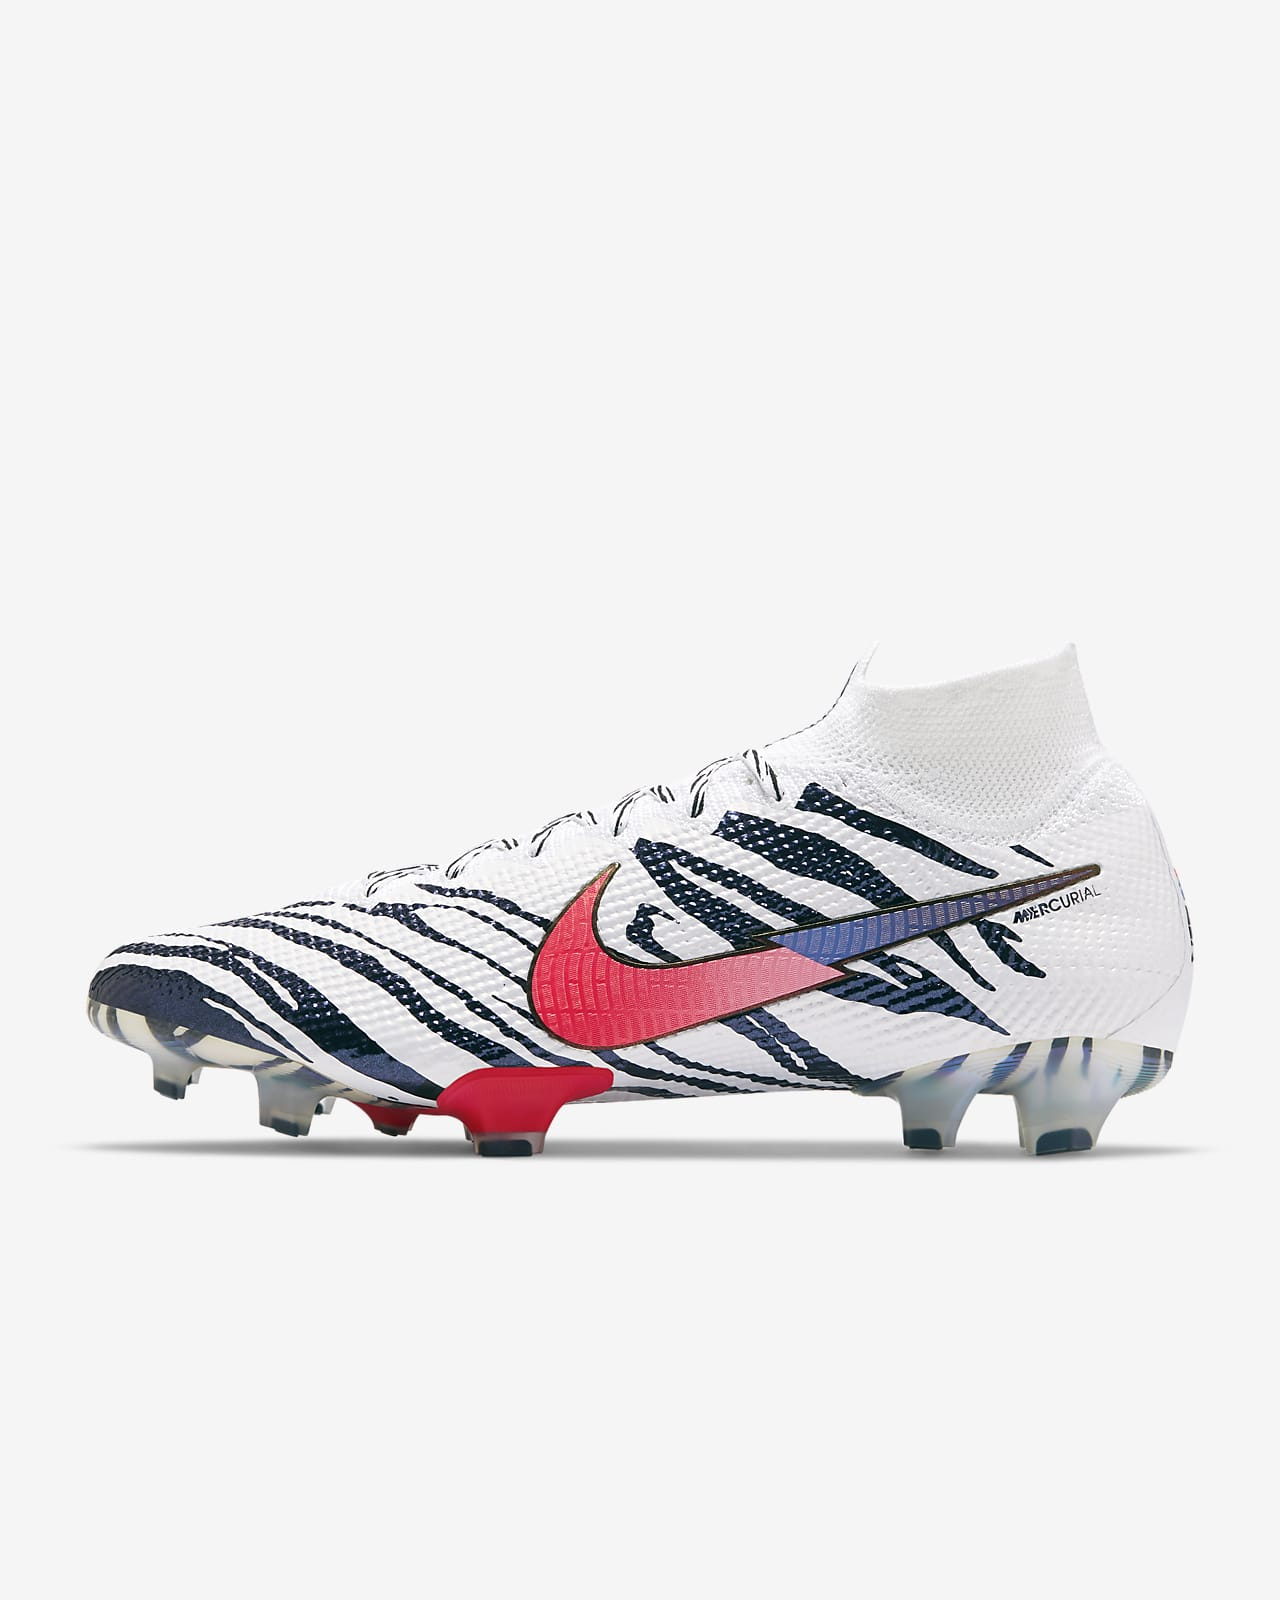 Nike Mercurial Superfly 7 Elite Korea FG Firm-Ground Football Boot